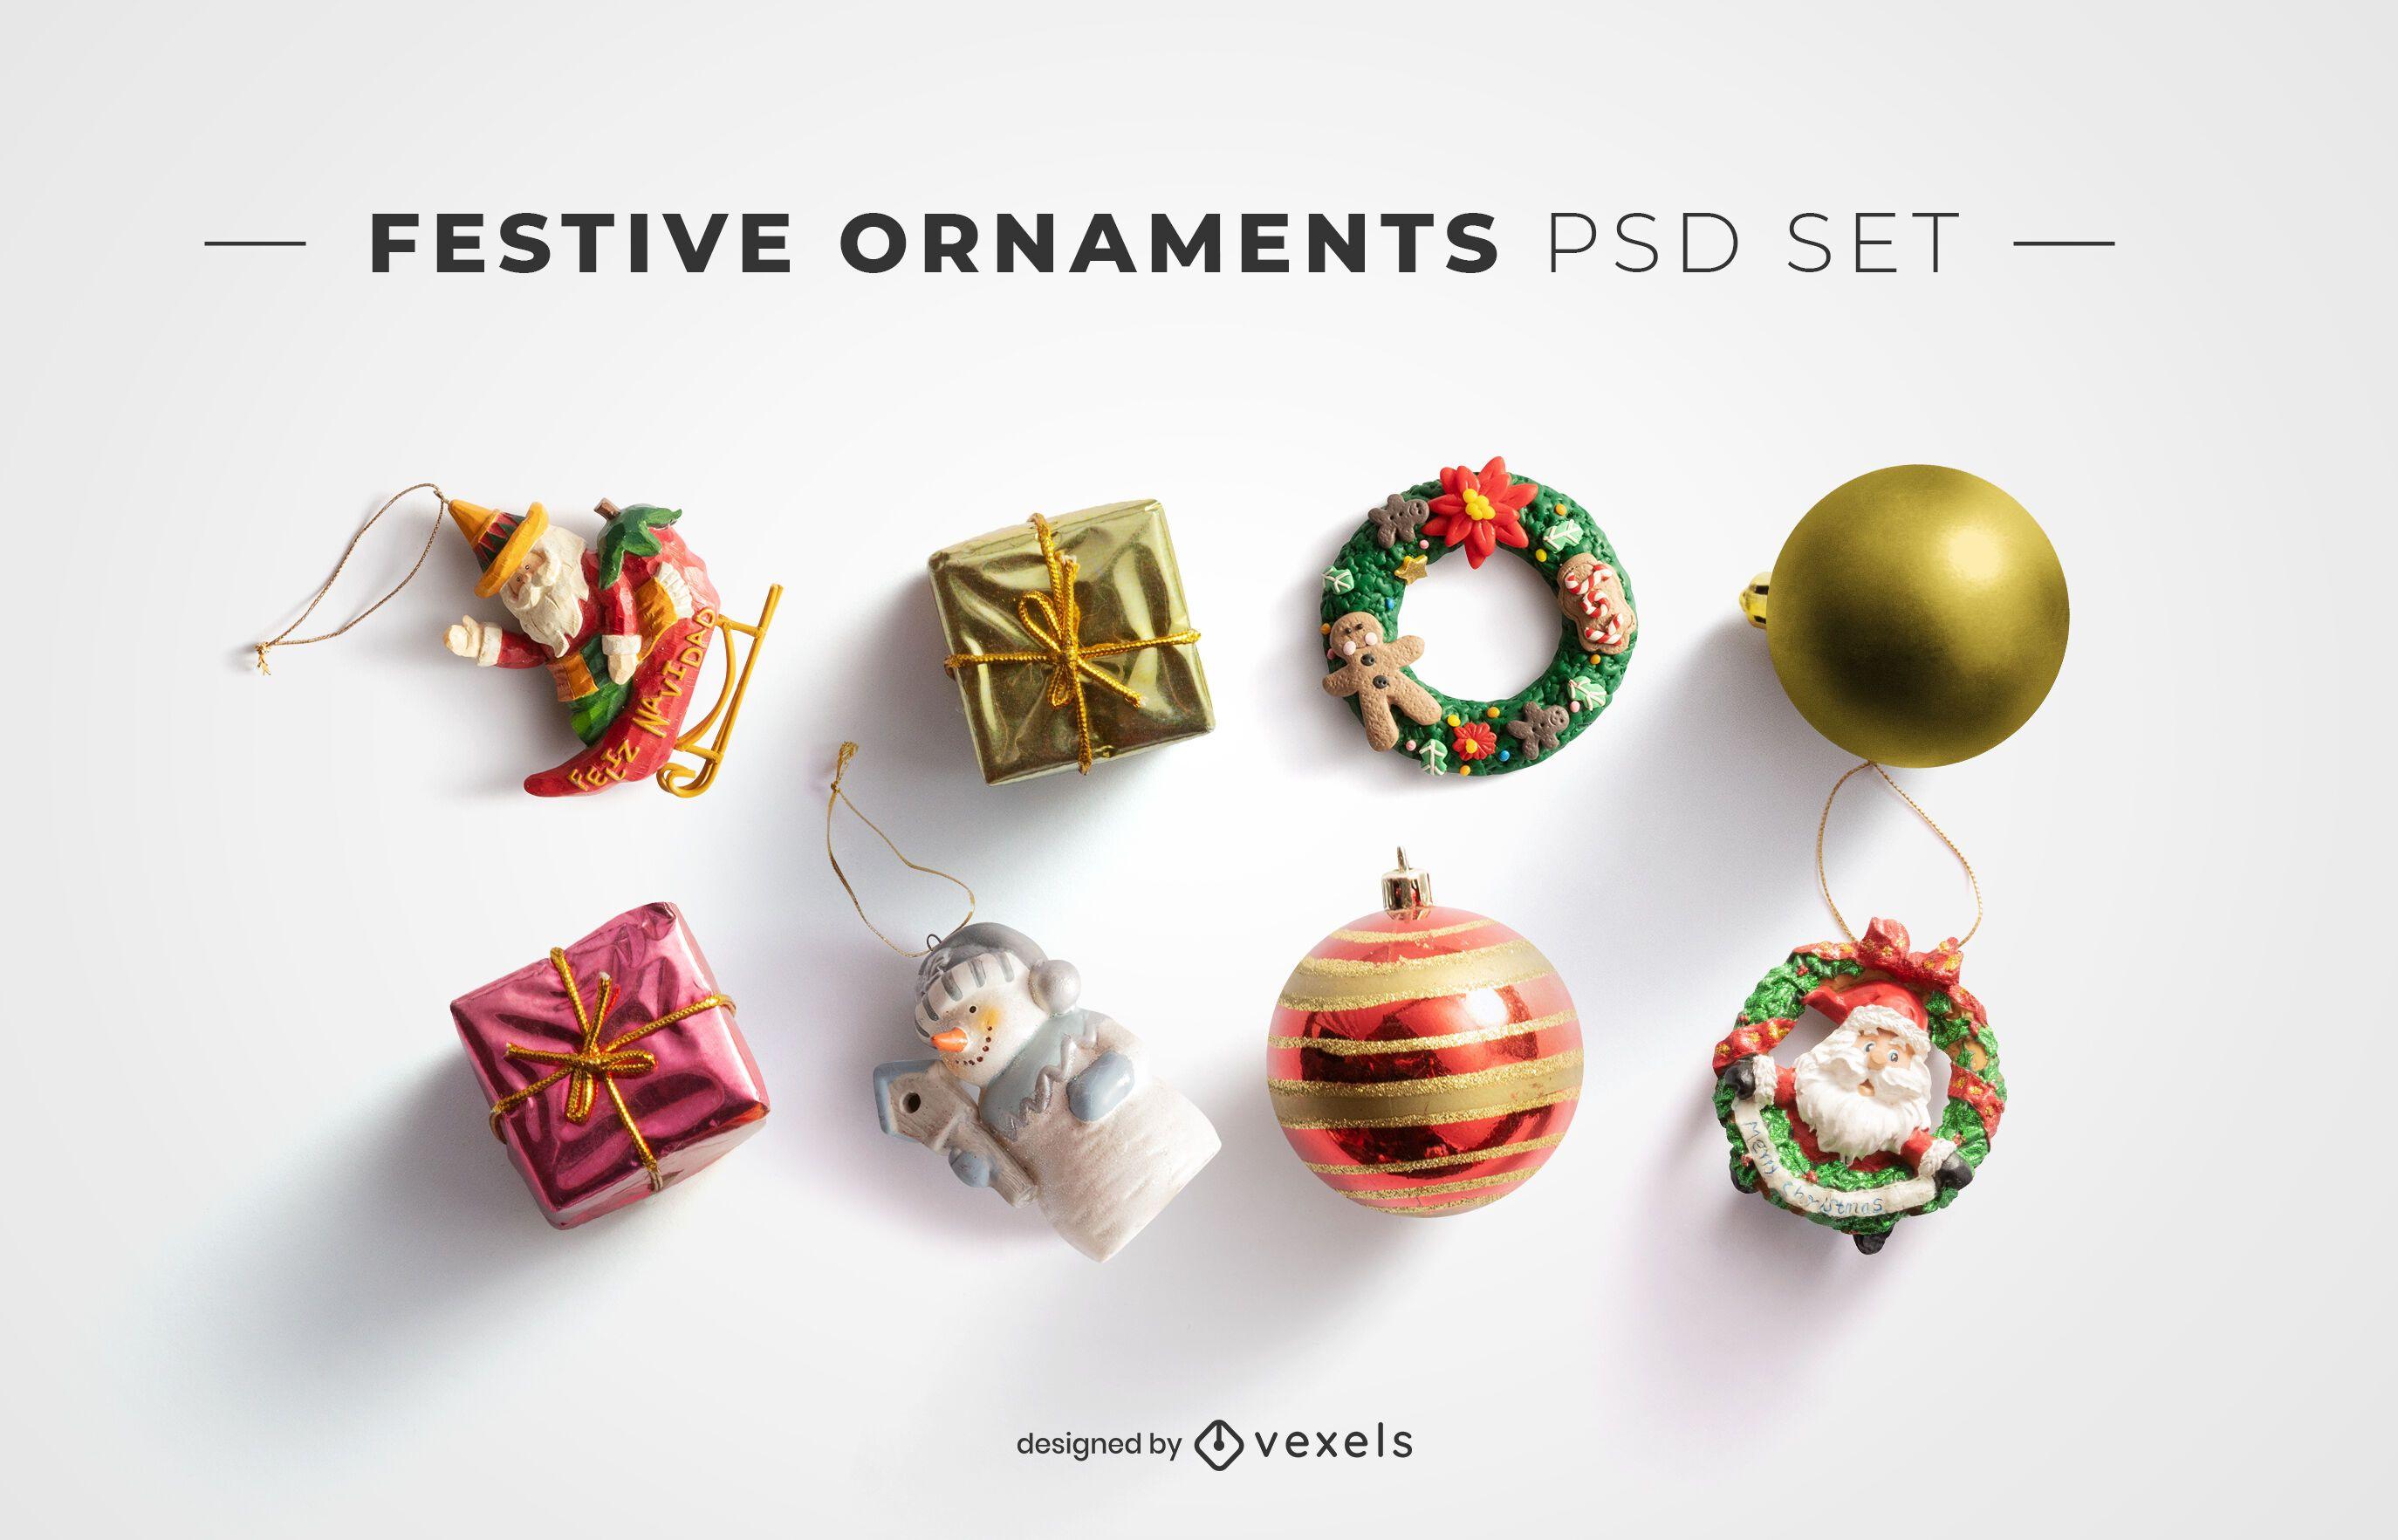 Festive ornaments psd elements for mockups